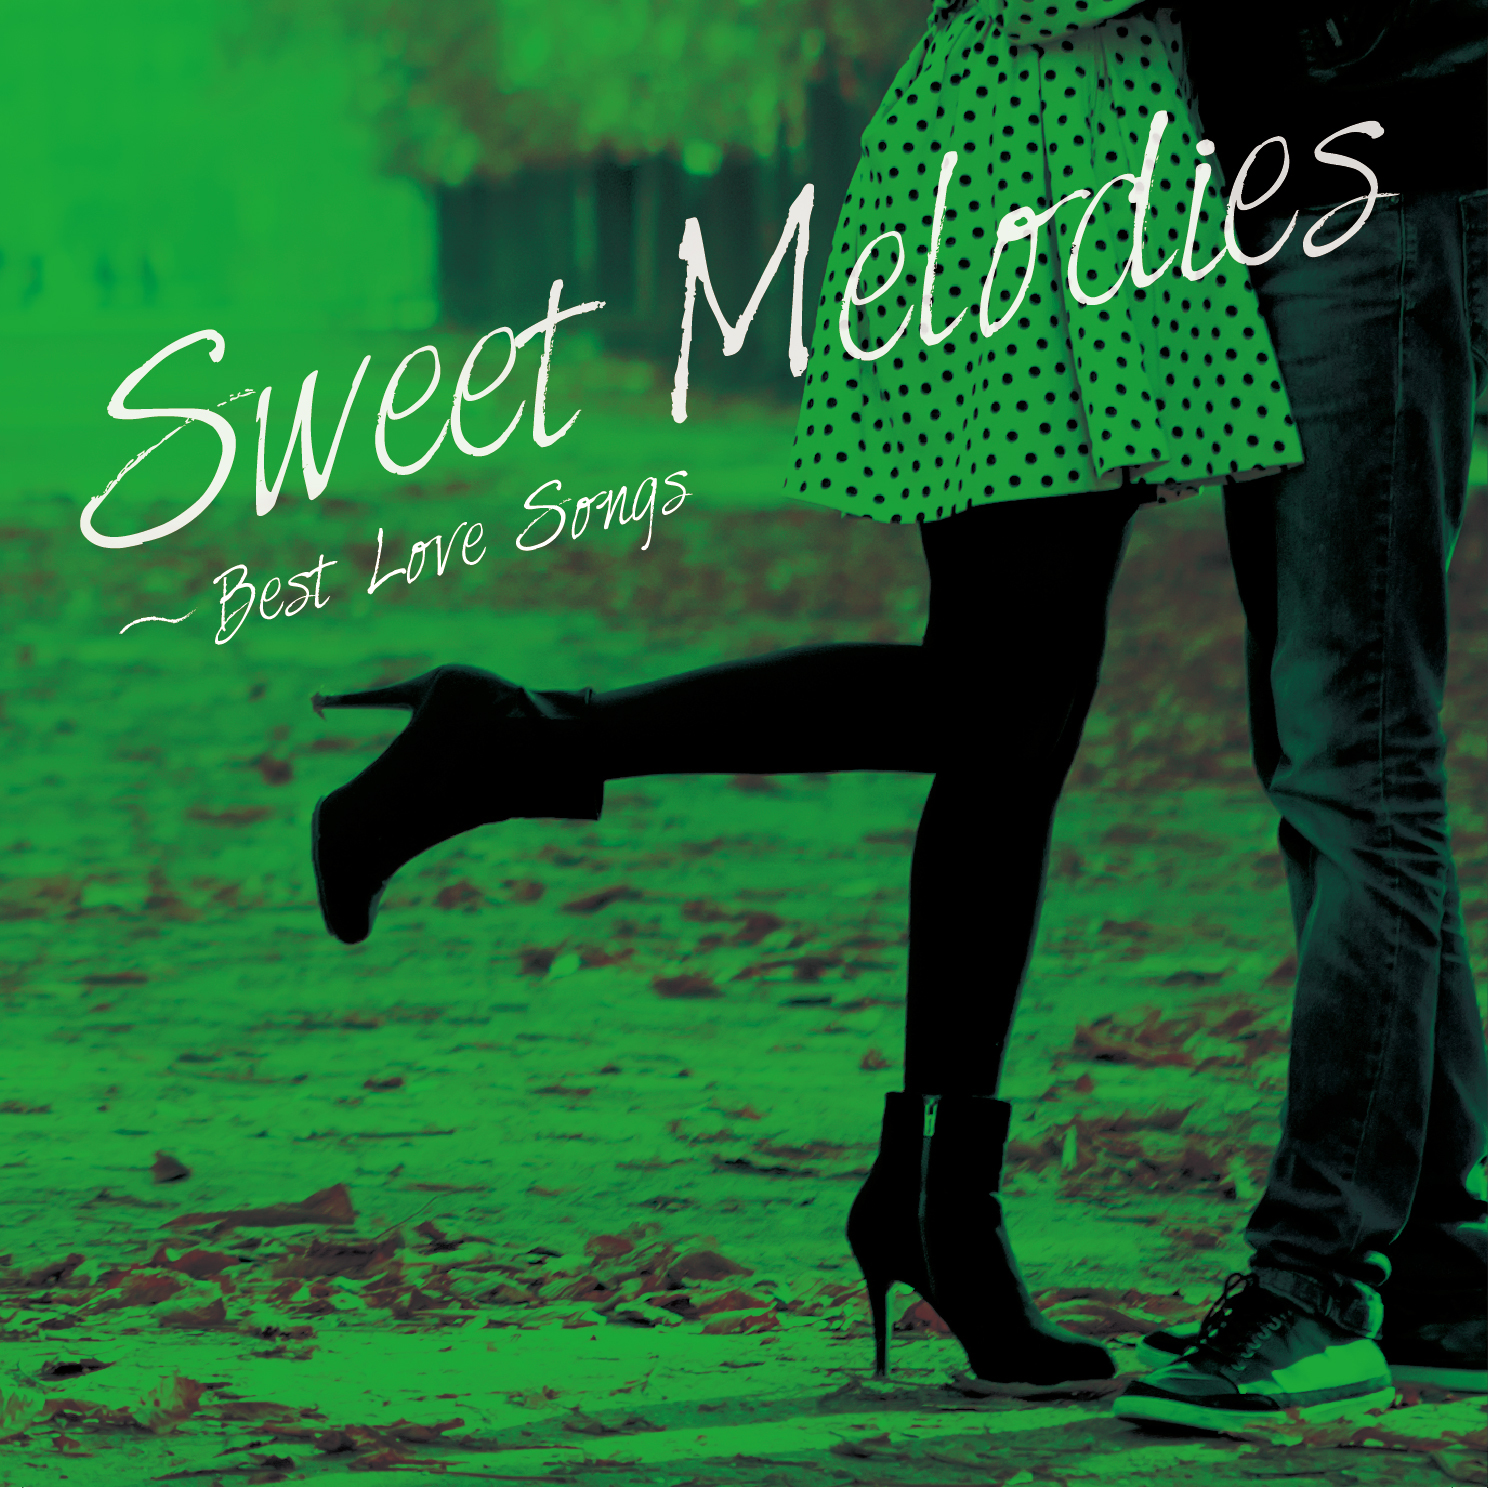 sweet melodies best love songs warner music life. Black Bedroom Furniture Sets. Home Design Ideas